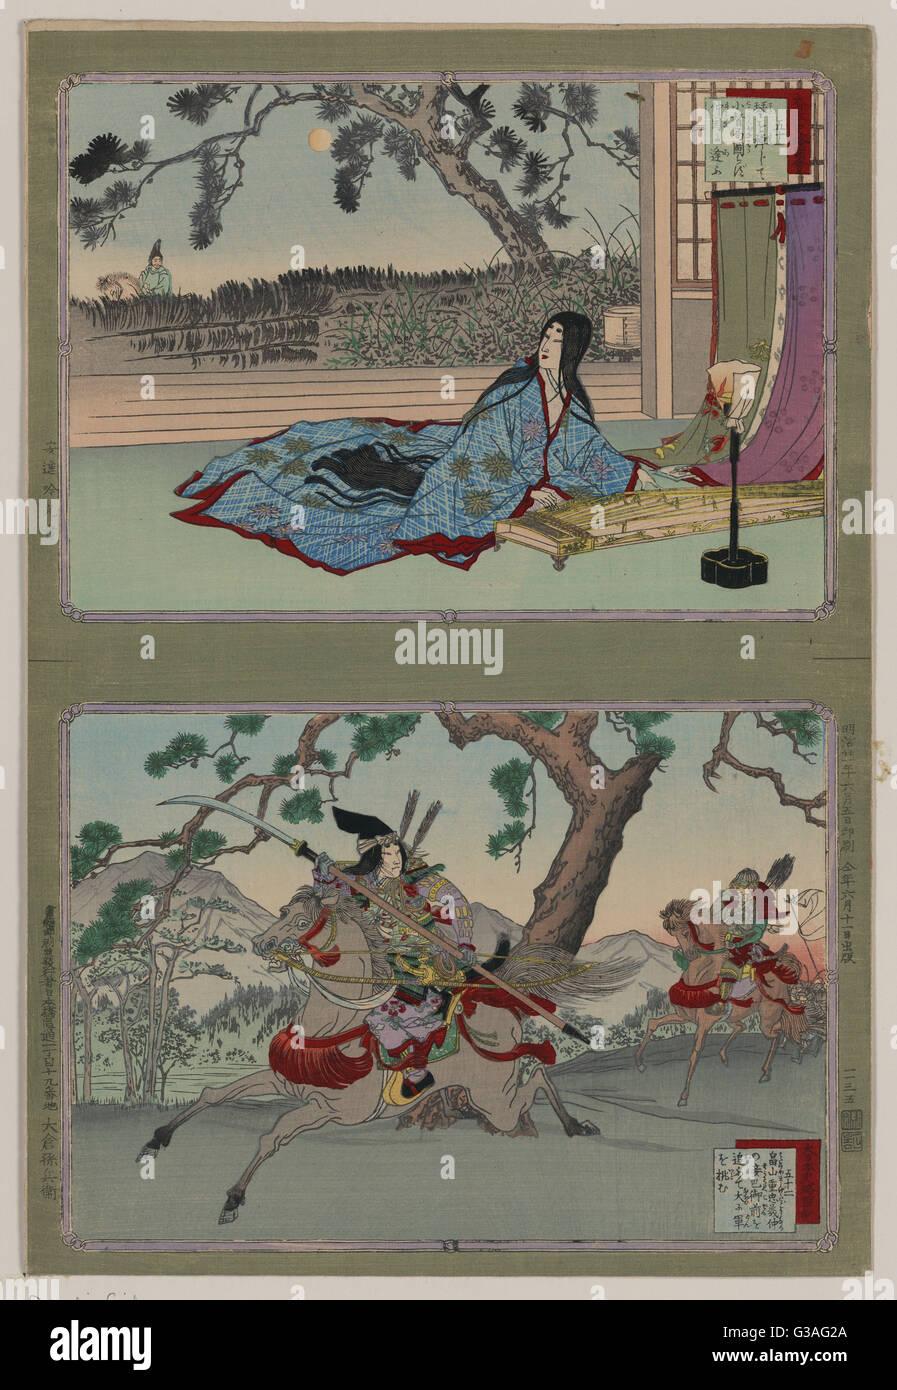 51: Kogo no Tsubone ; 52: Tomoe Gozen. Print shows (top half) Kogo no Tsubone, the emperor's mistress, lying - Stock Image